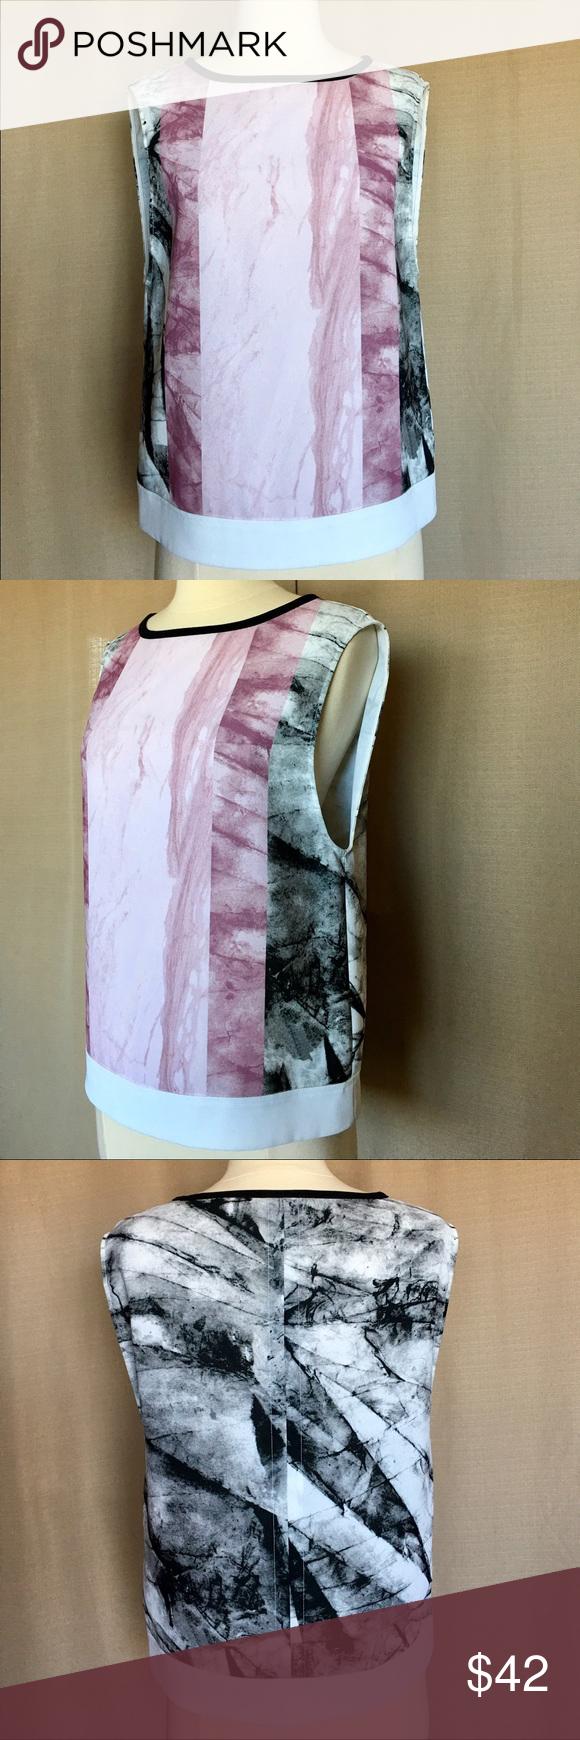 ❤️HELMUT LIANG HYDRA MARBLE PRINT TOP   Clothes design, Print ...